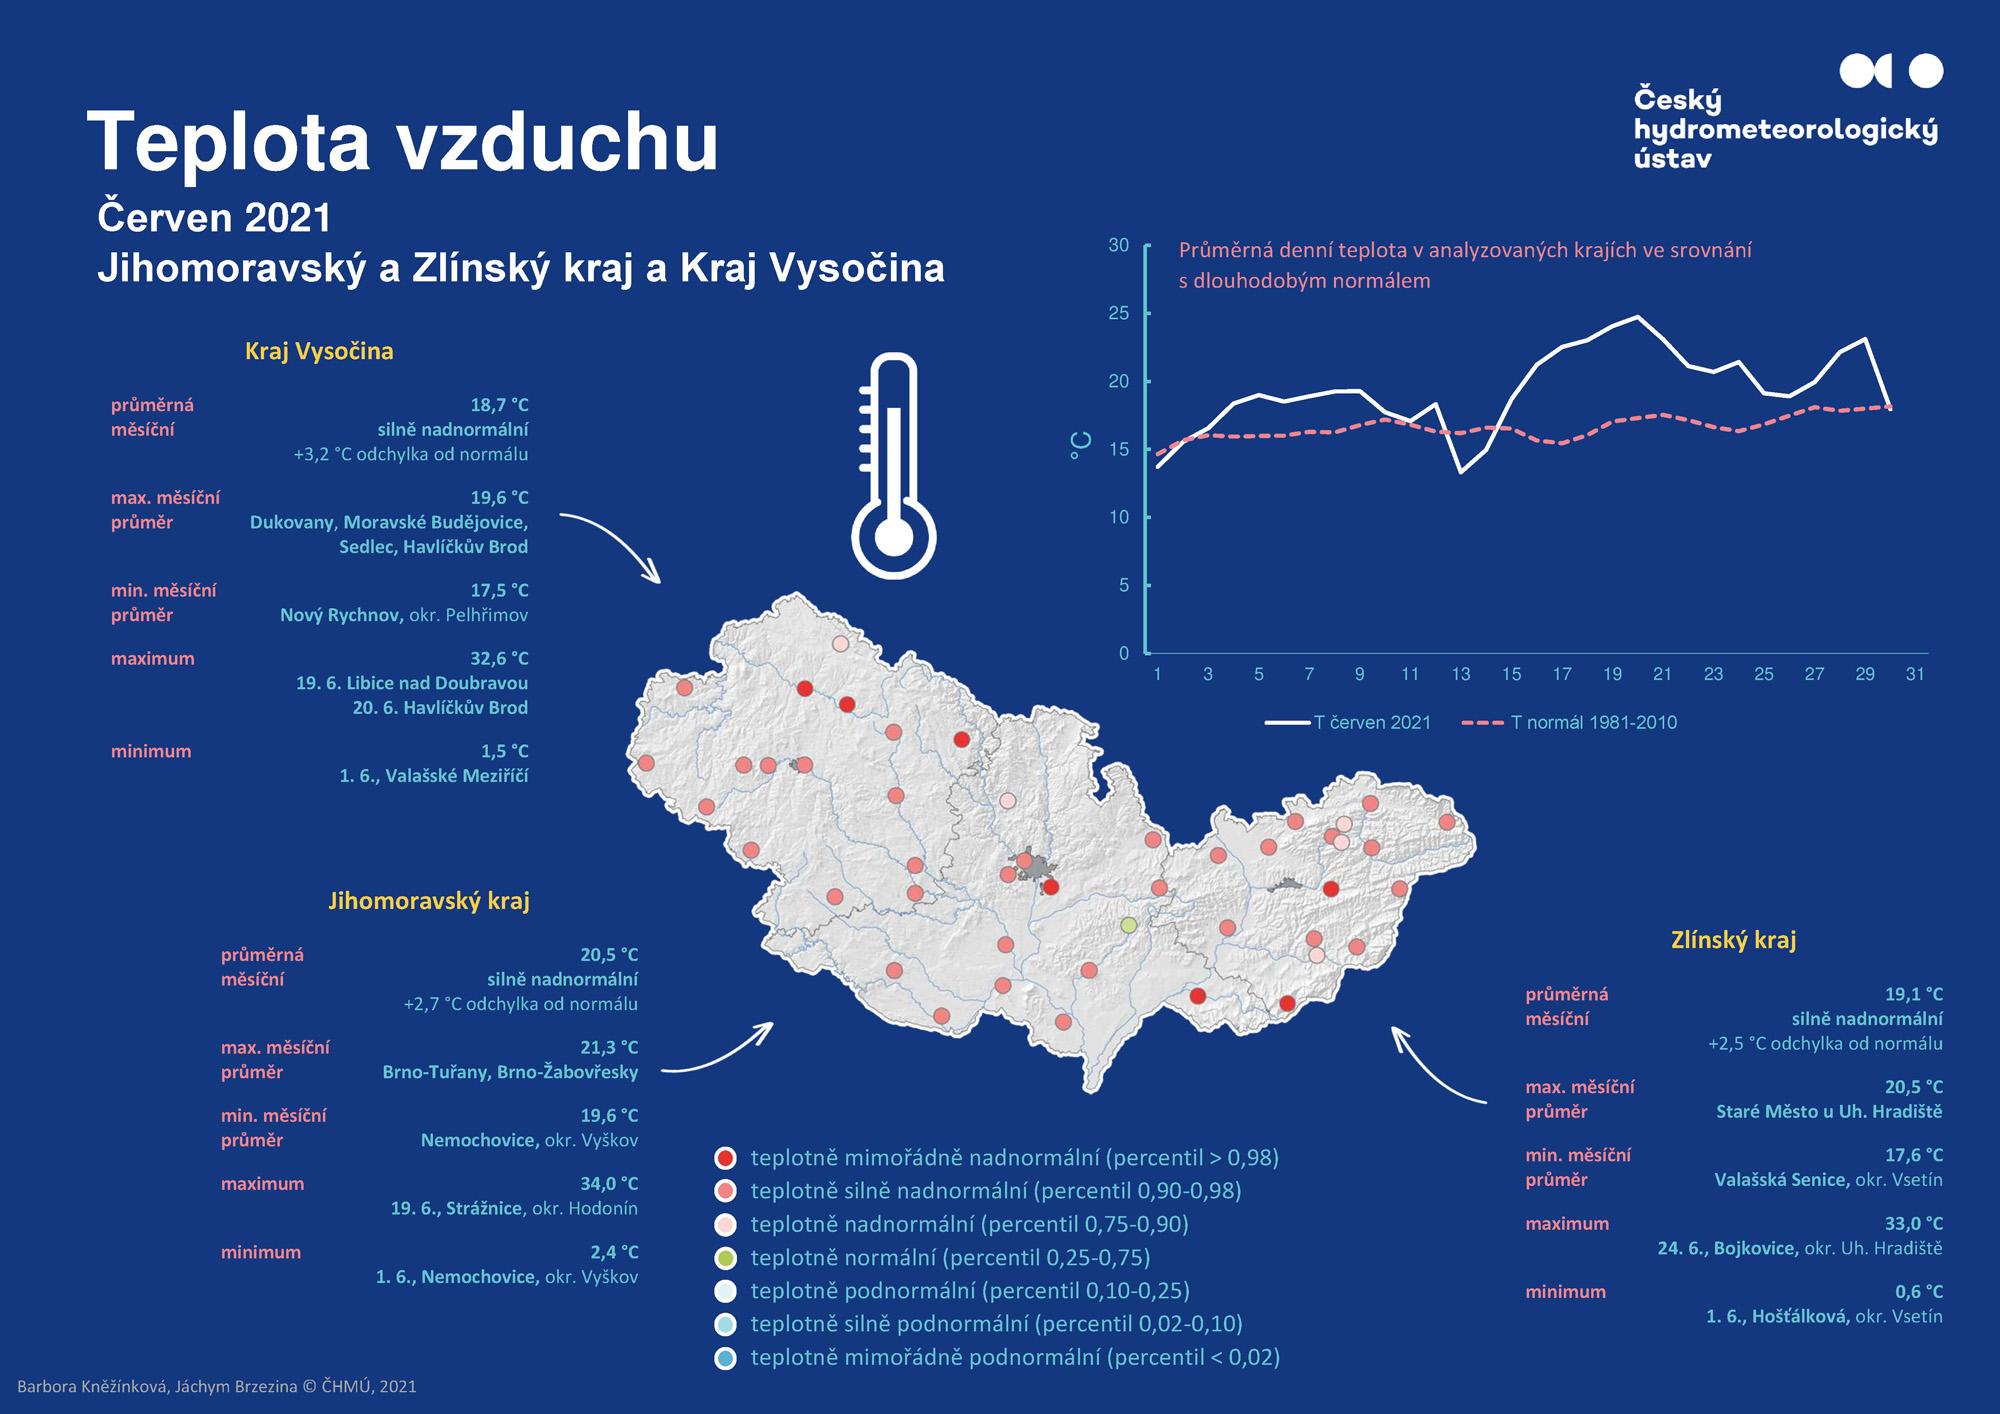 Teplota vzduchu v červnu 2021 – Jihomoravský kraj, Zlínský kraj a Kraj Vysočina1 min čtení